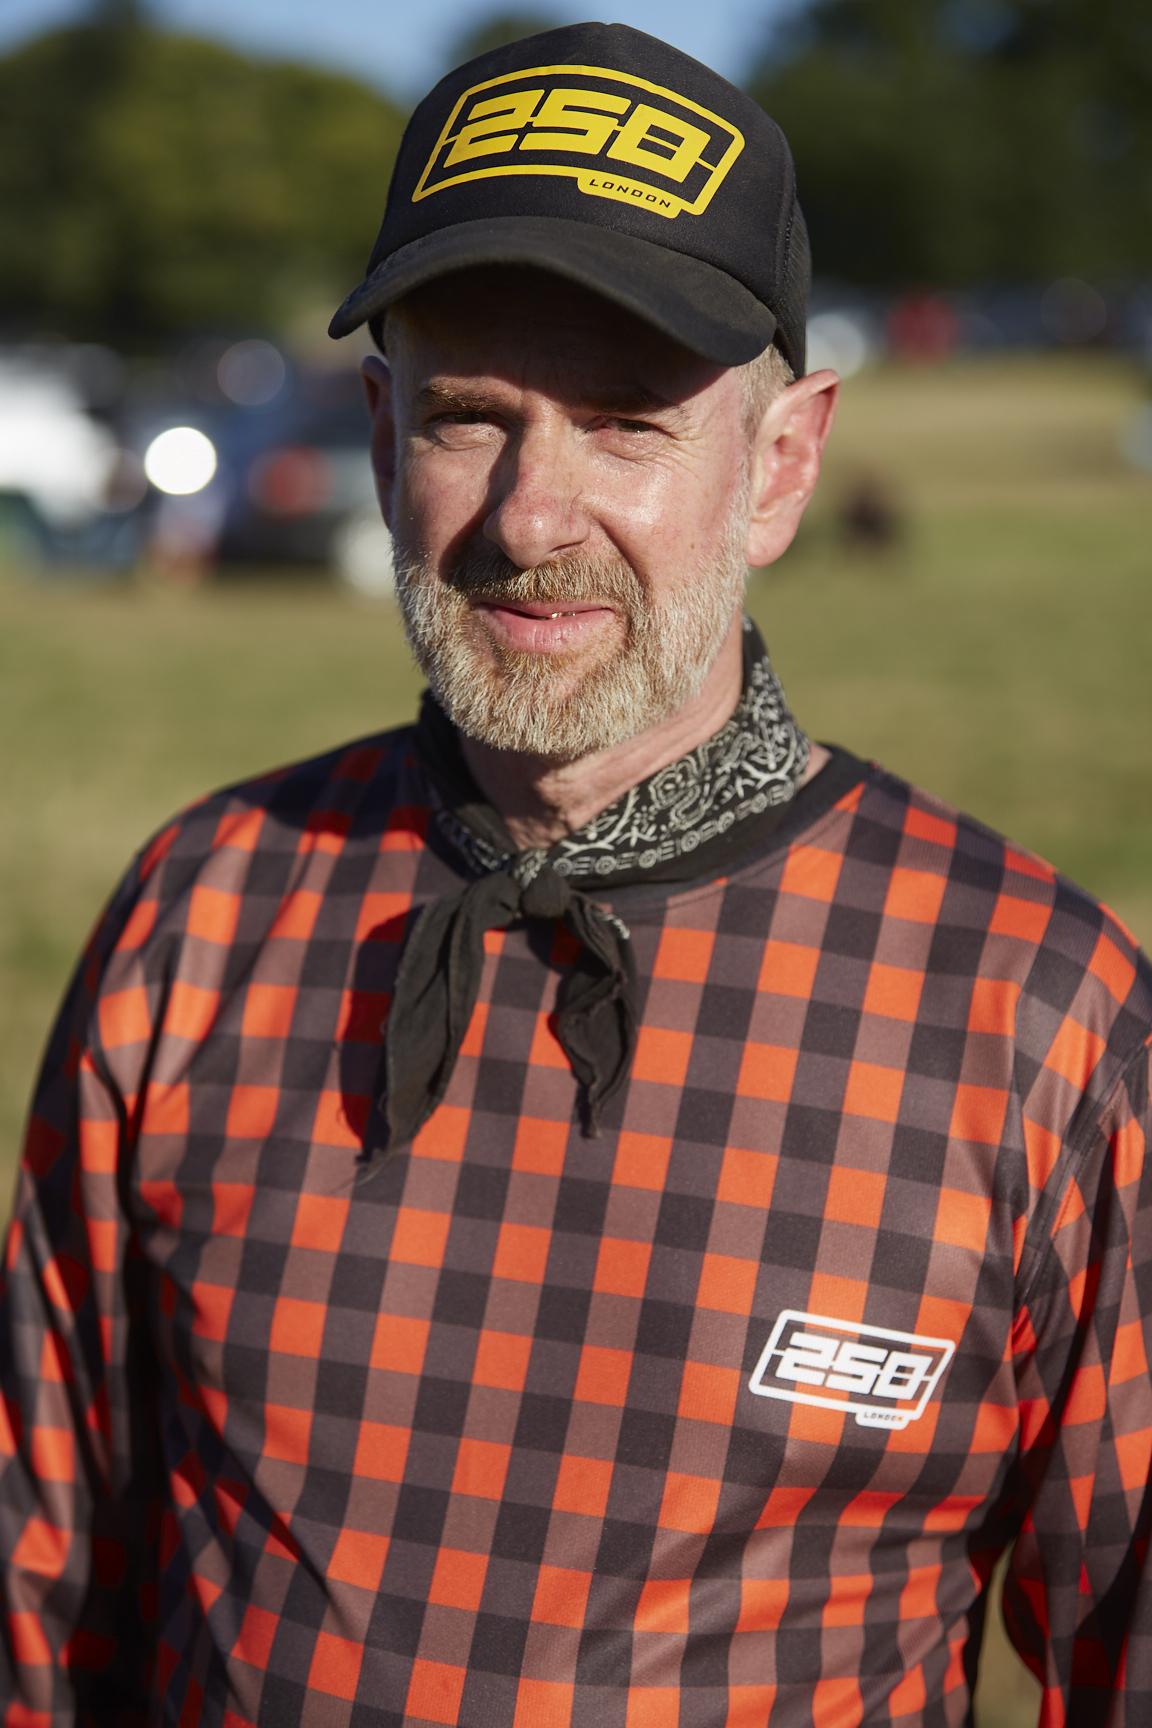 Tony Davis, always the style-monger!   Image: Marek Puc